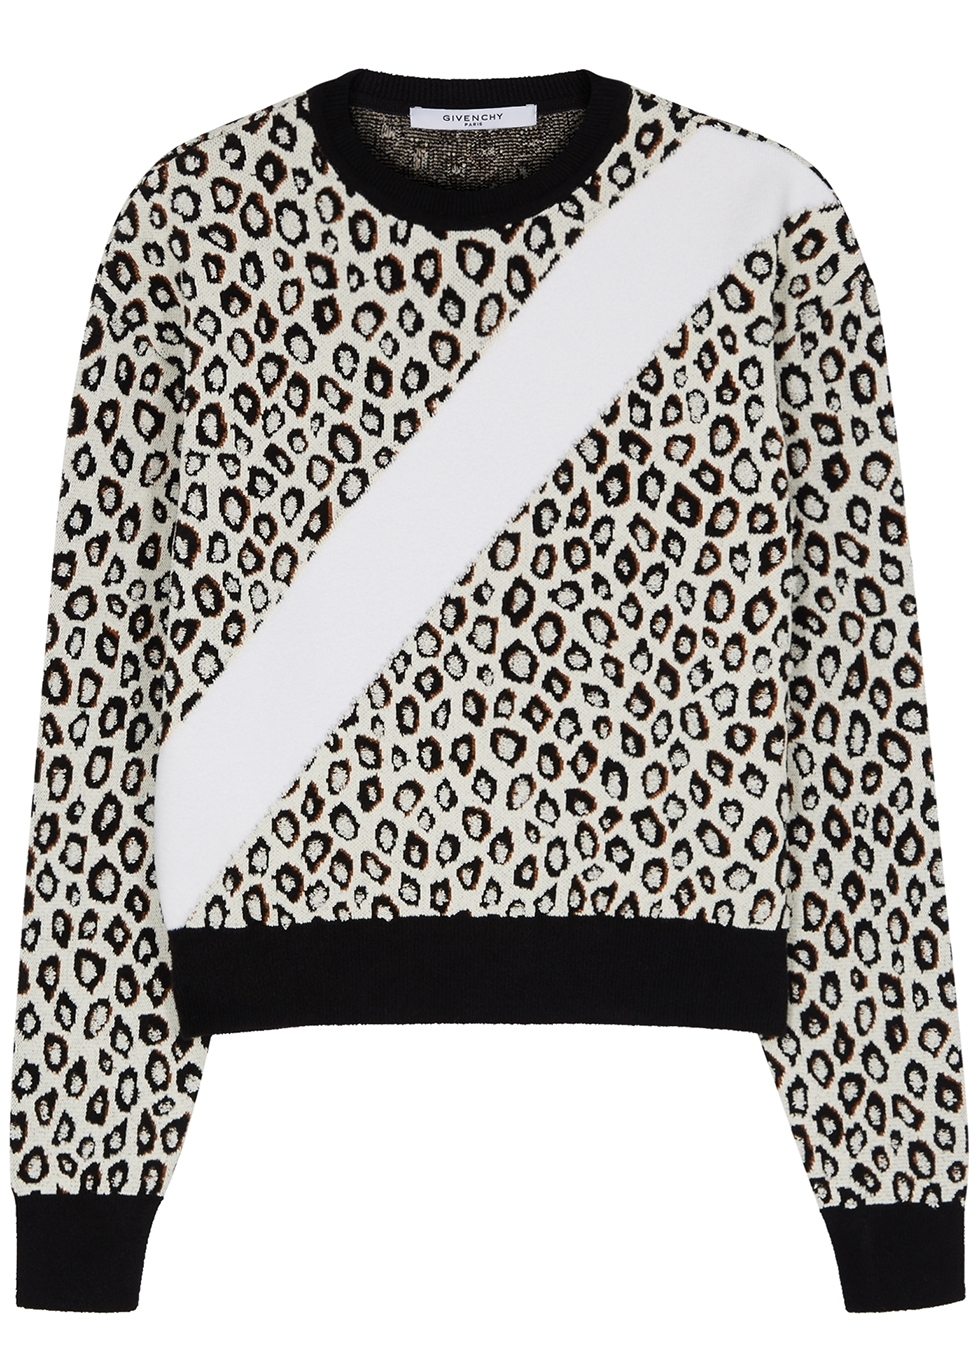 6270c564b2 Givenchy - Womens - Harvey Nichols